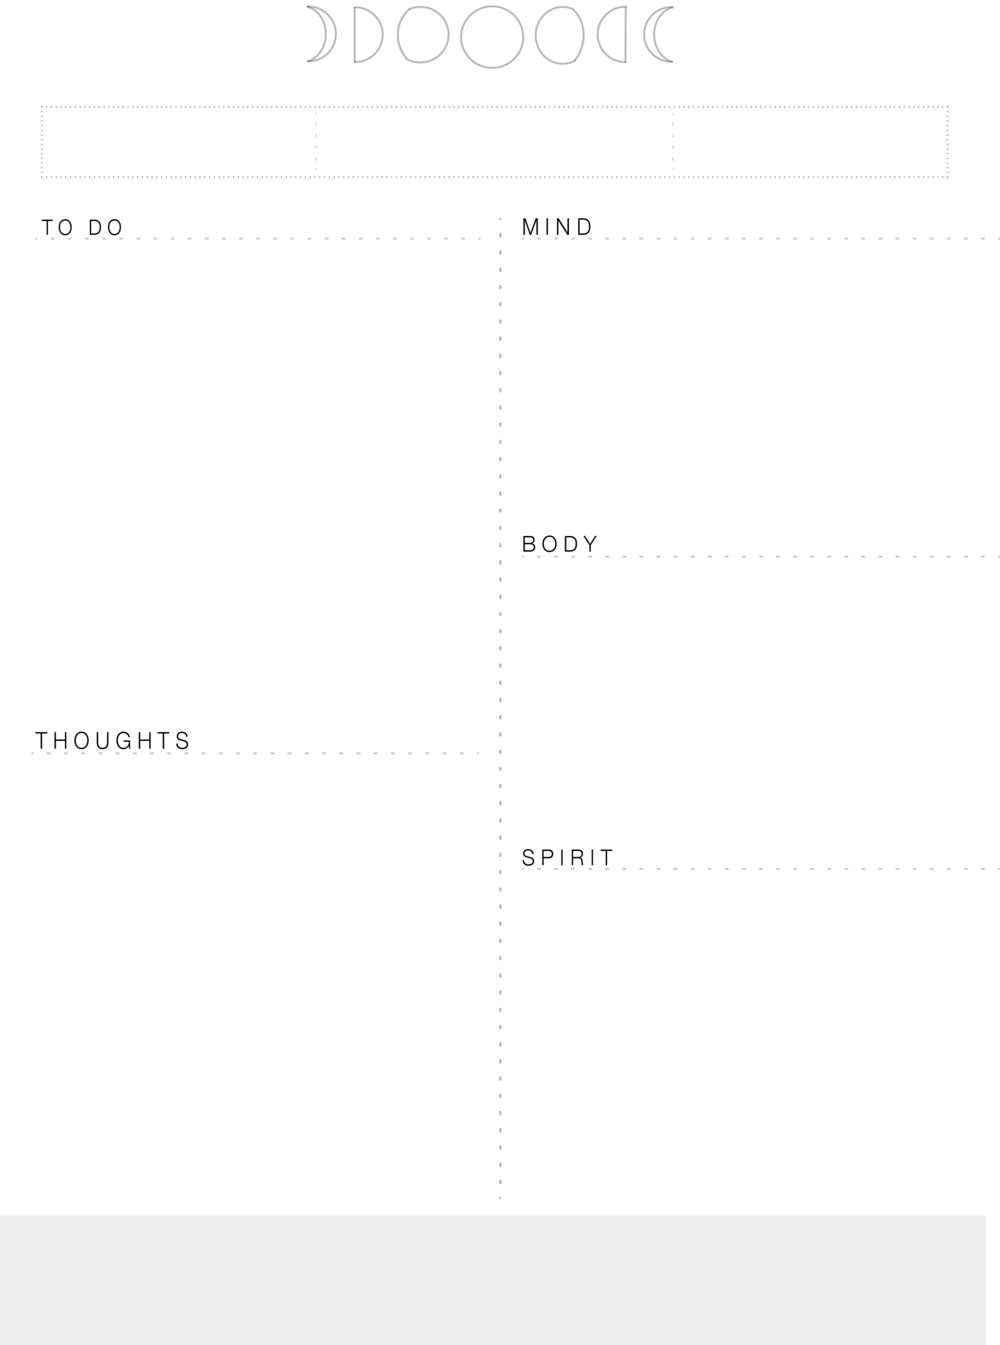 plannerdashedlines.jpg